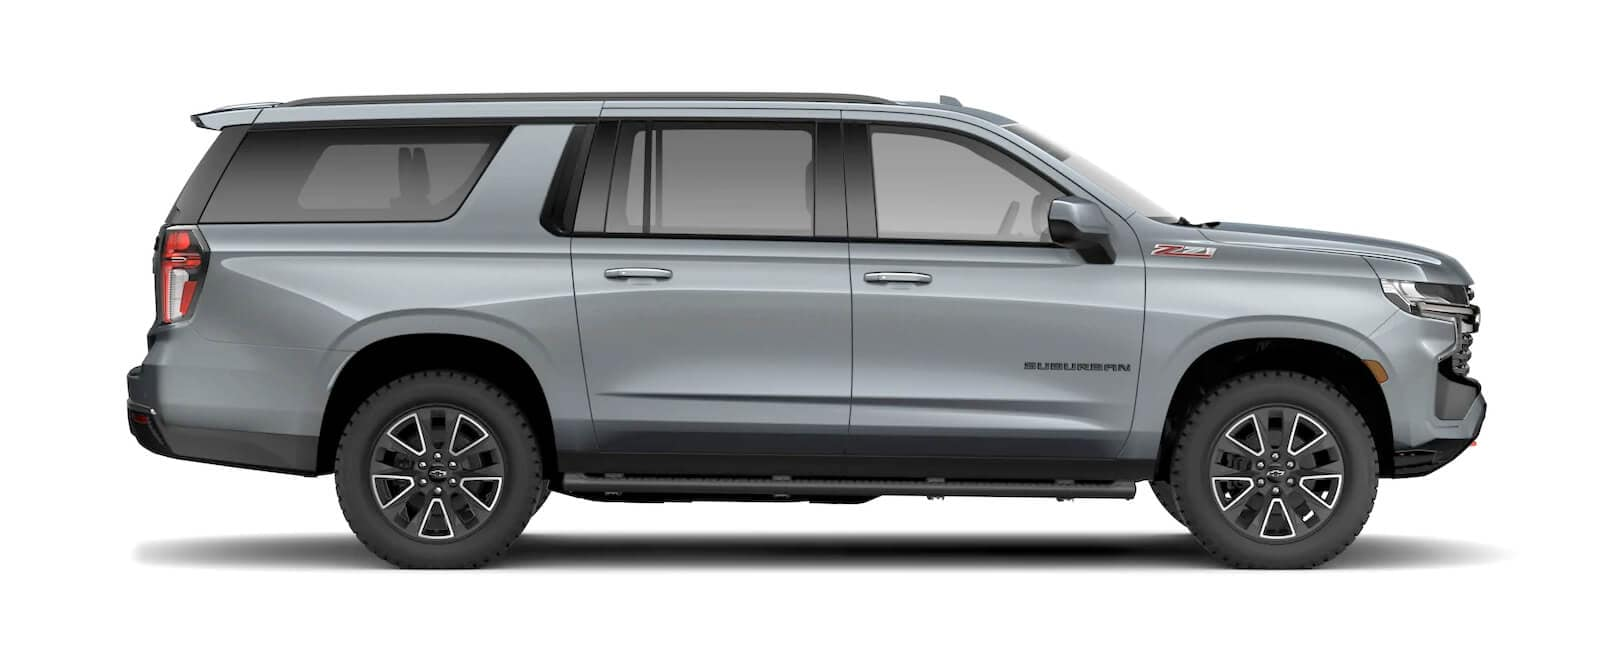 New Chevrolet Vehicles 2021 Suburban